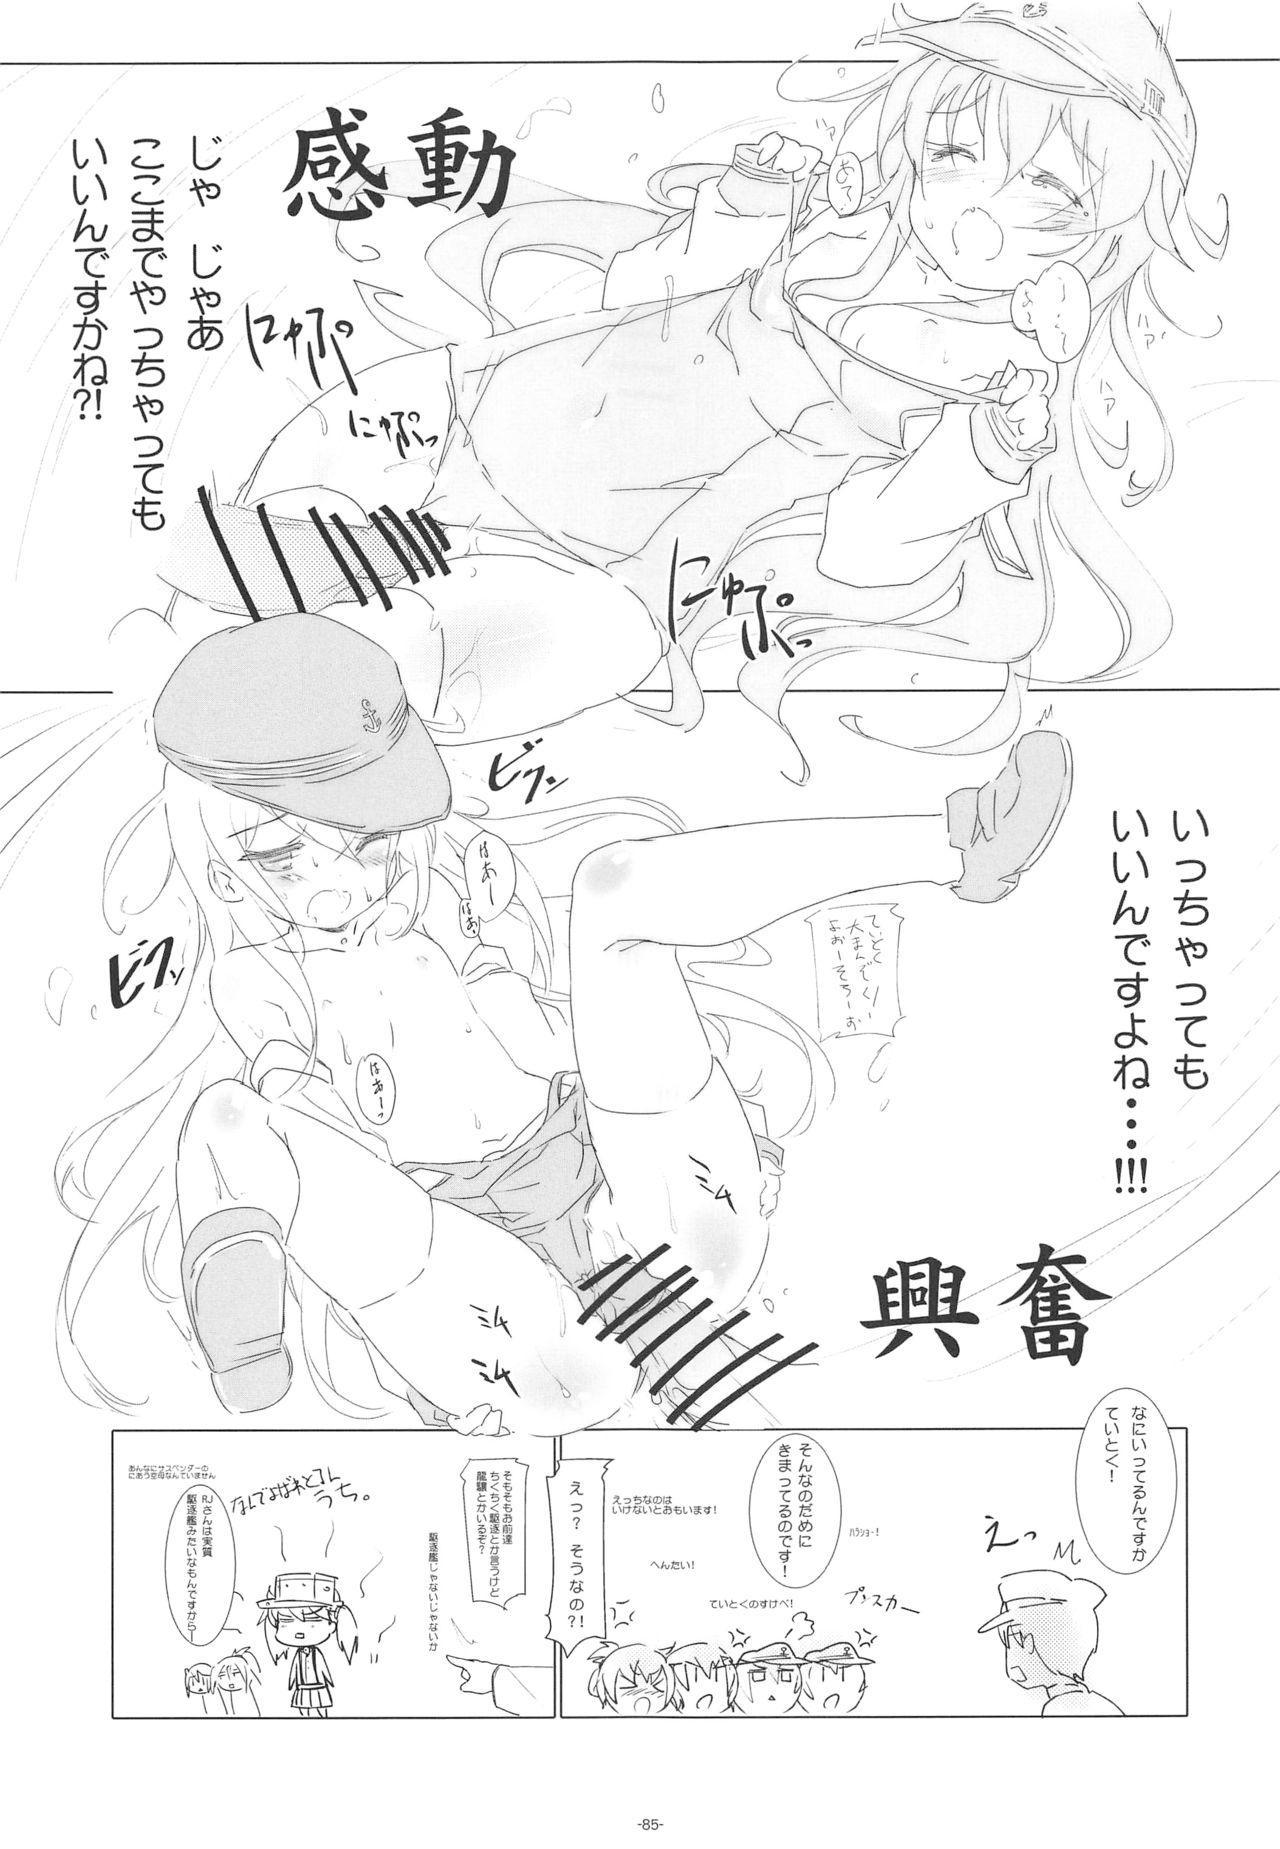 Korokoro-Manman II Korokoro:P Soushuuhen II 83